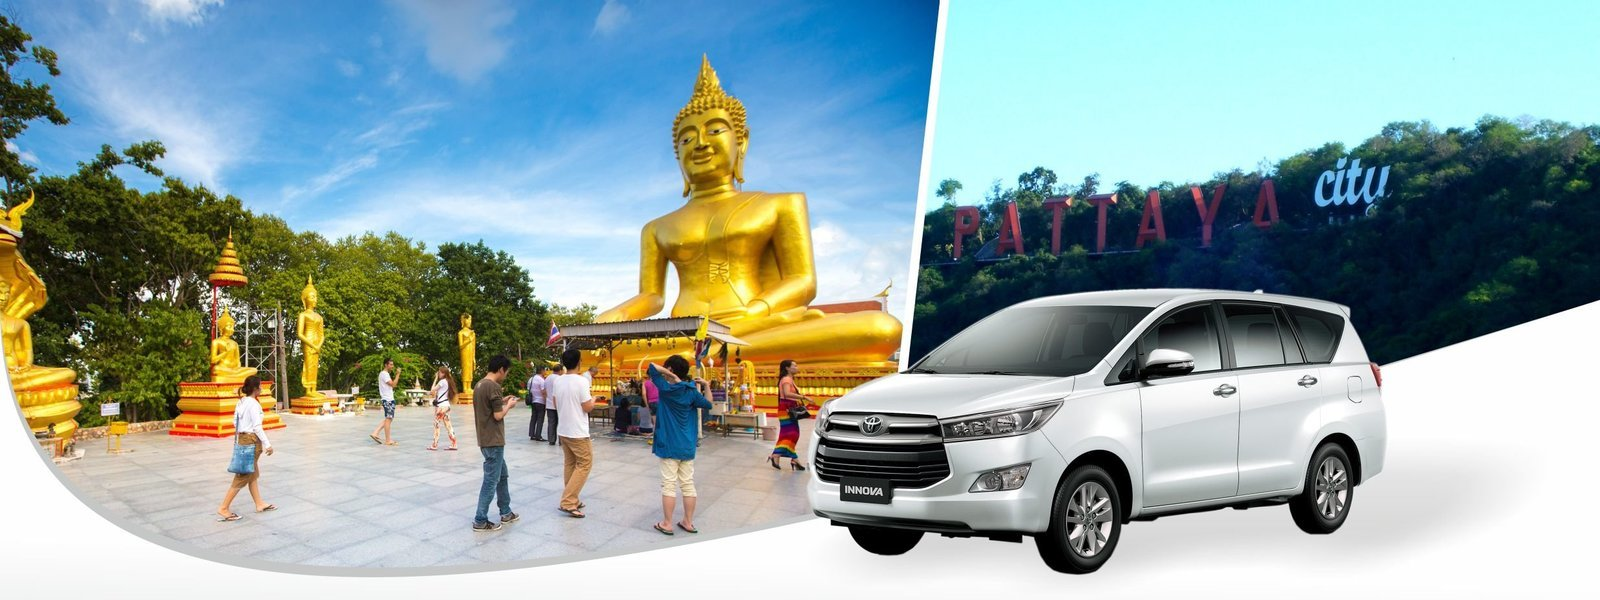 DMK (Don Mueang Airport Bangkok) To Pattaya Hotel(SUV) - Tour